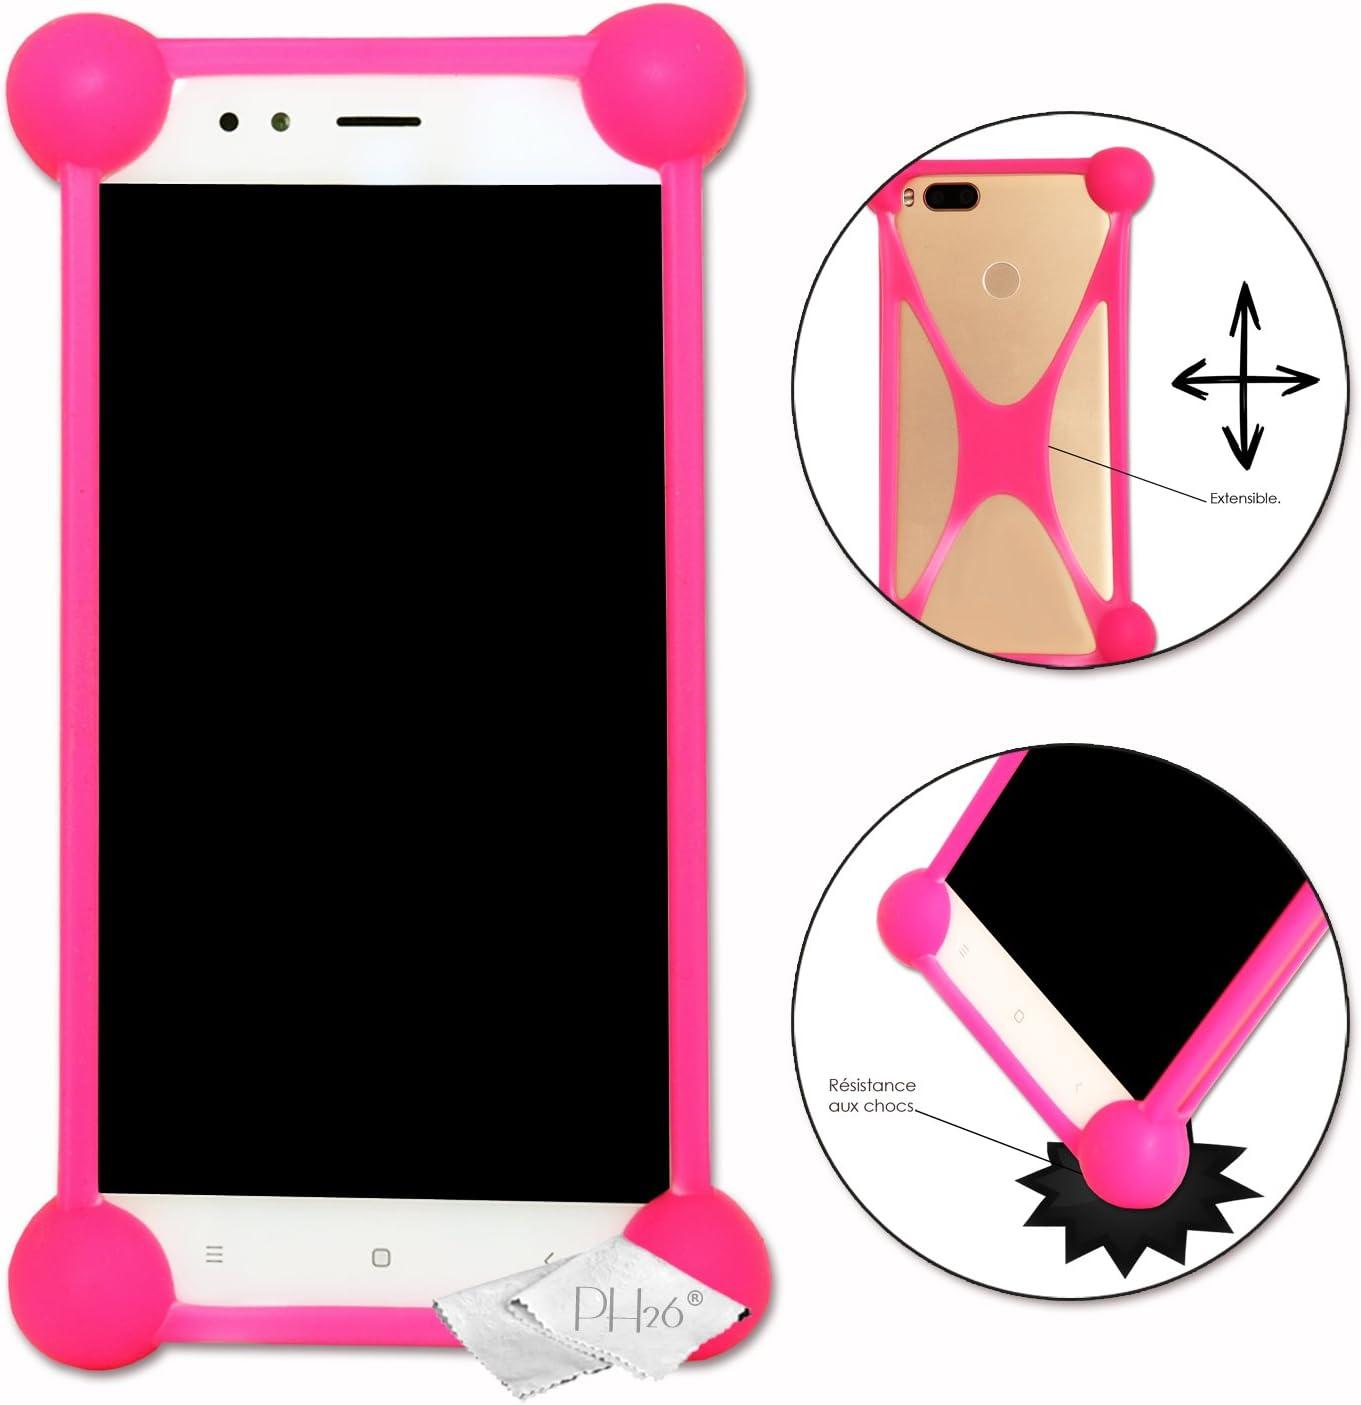 Shockproof Silicone Bumper Case for SH-01H Low price Zeta Manufacturer OFFicial shop Sharp Pink Aquos